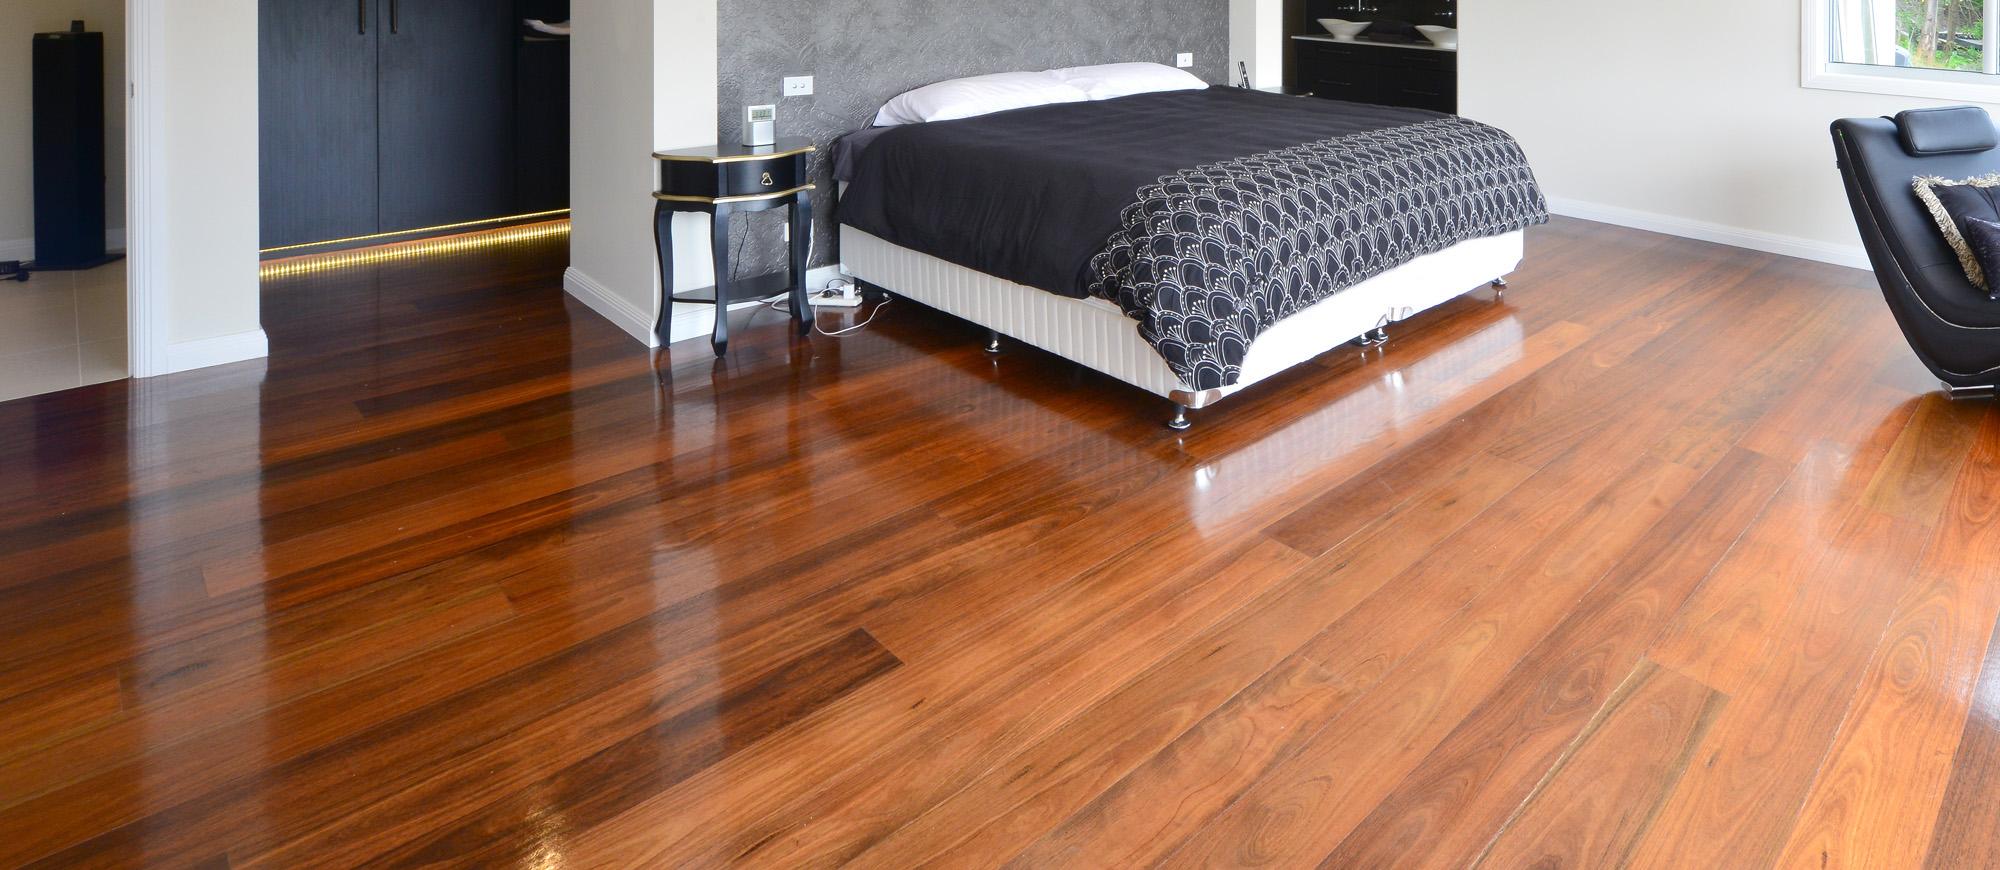 Central Coast Floor Maintenance